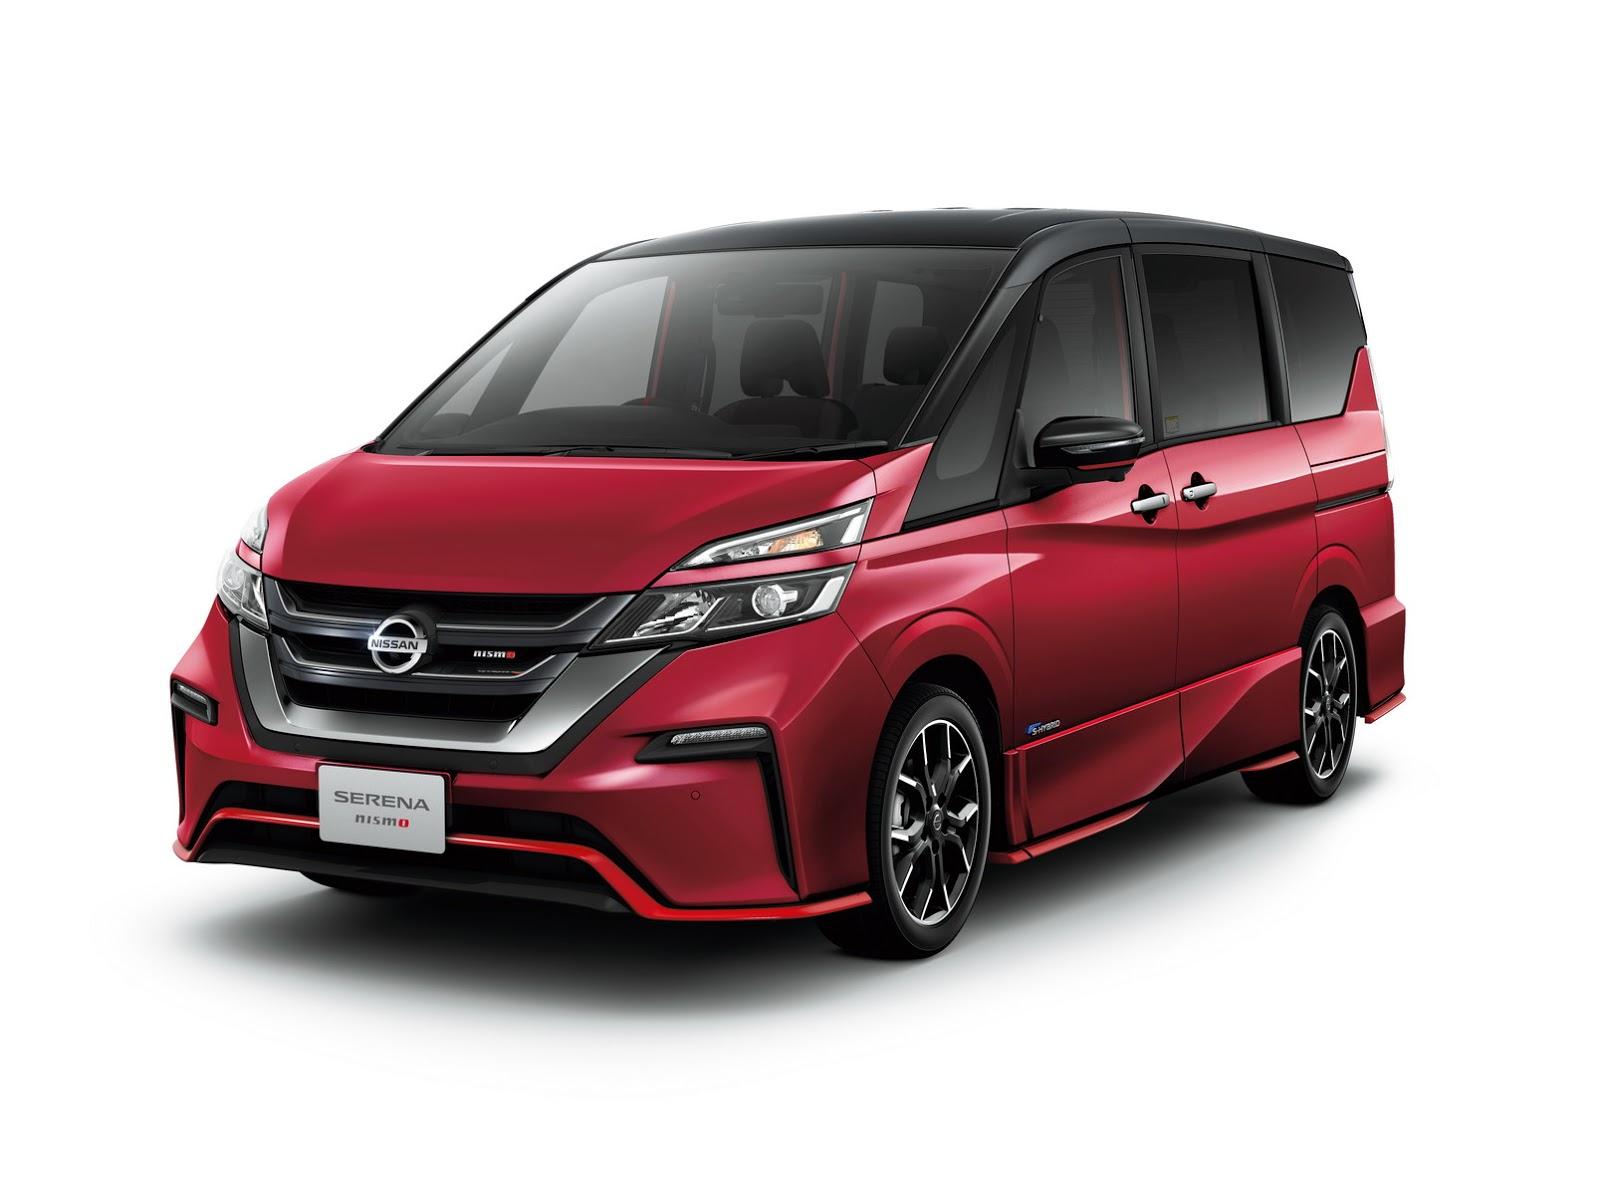 Nissan_Serena_Nismo_18